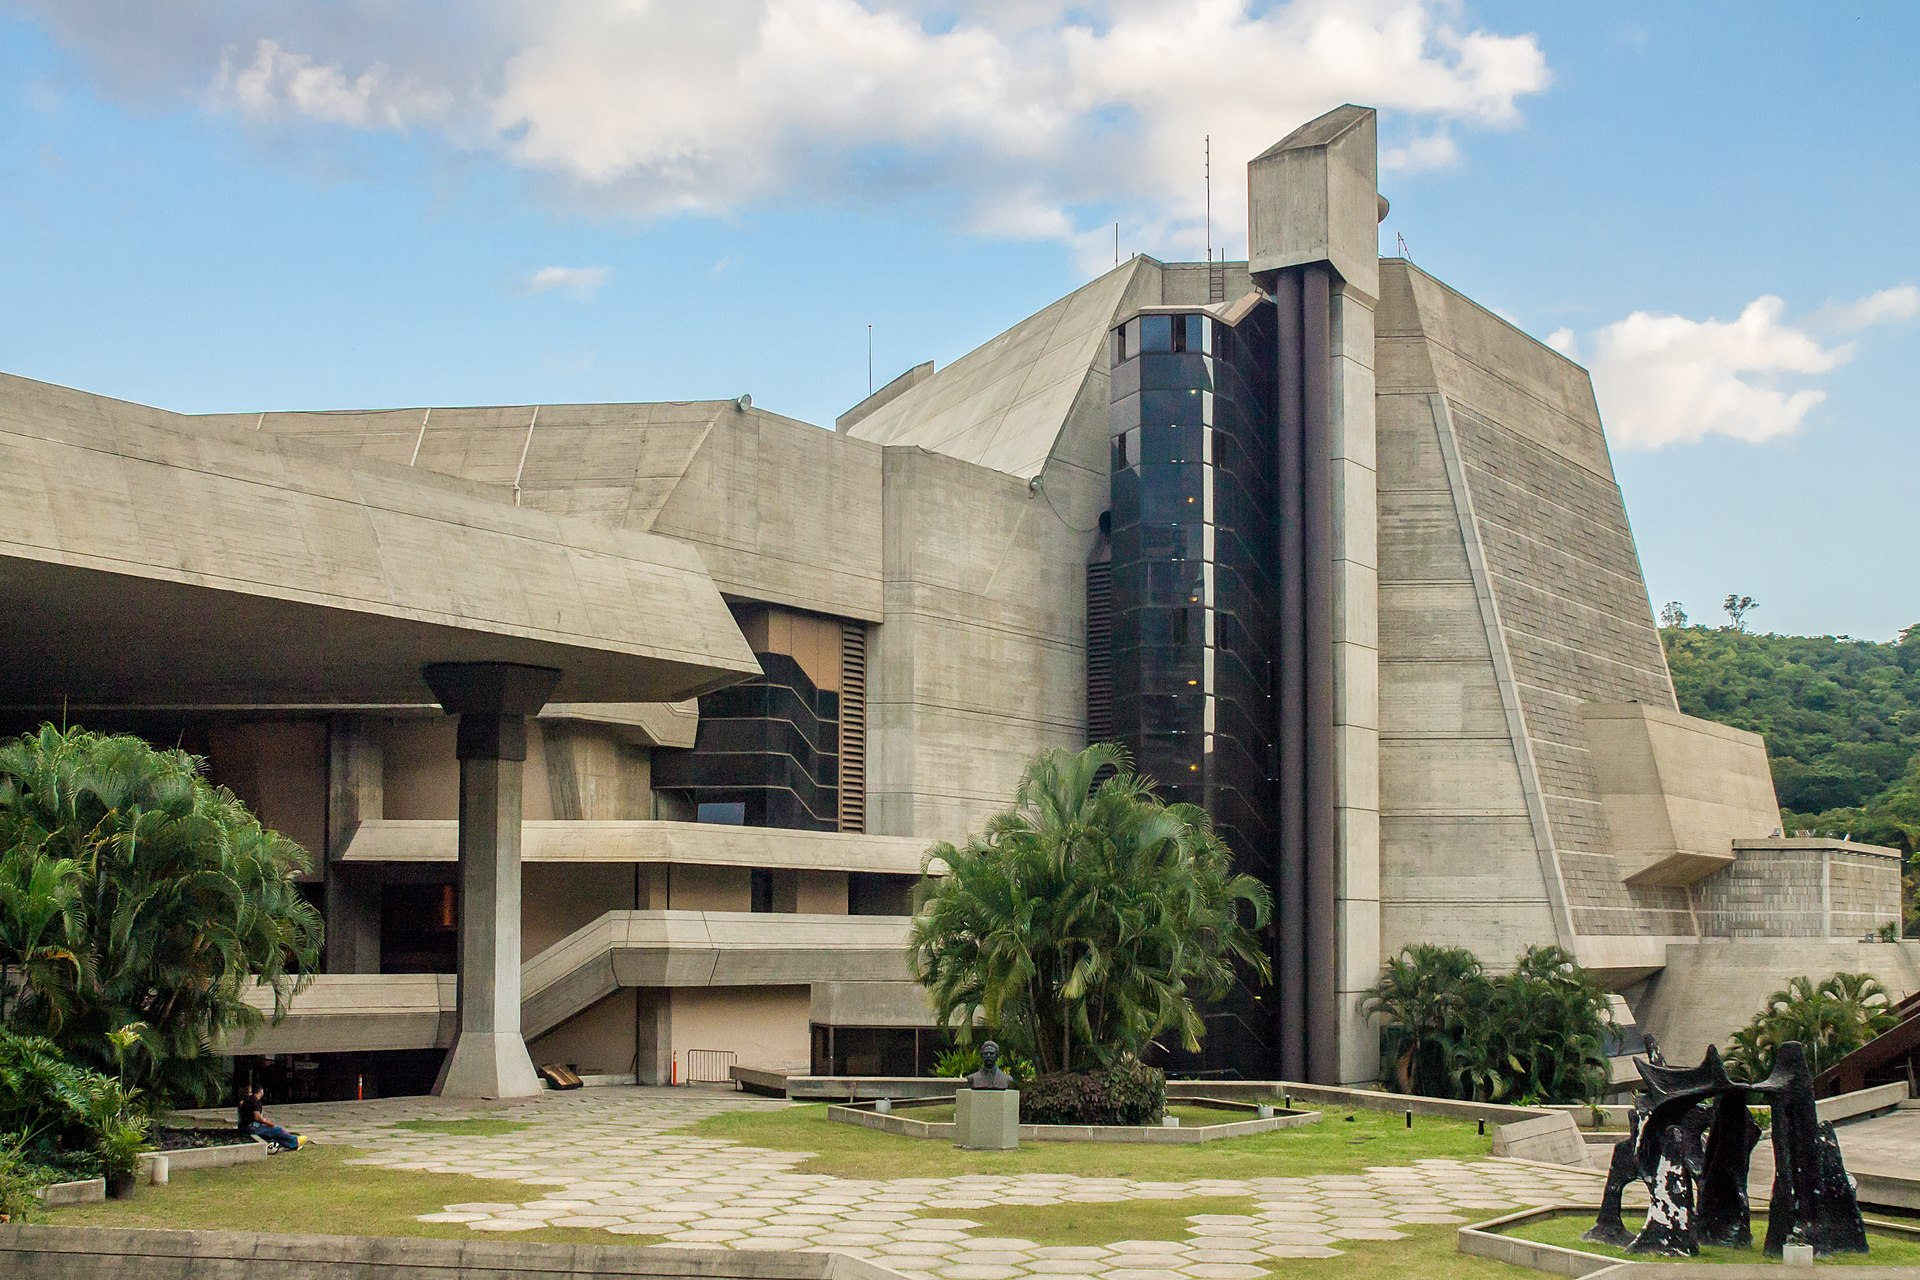 Arquitectura brutalista wikipedia la enciclopedia libre - Que es un porche en arquitectura ...